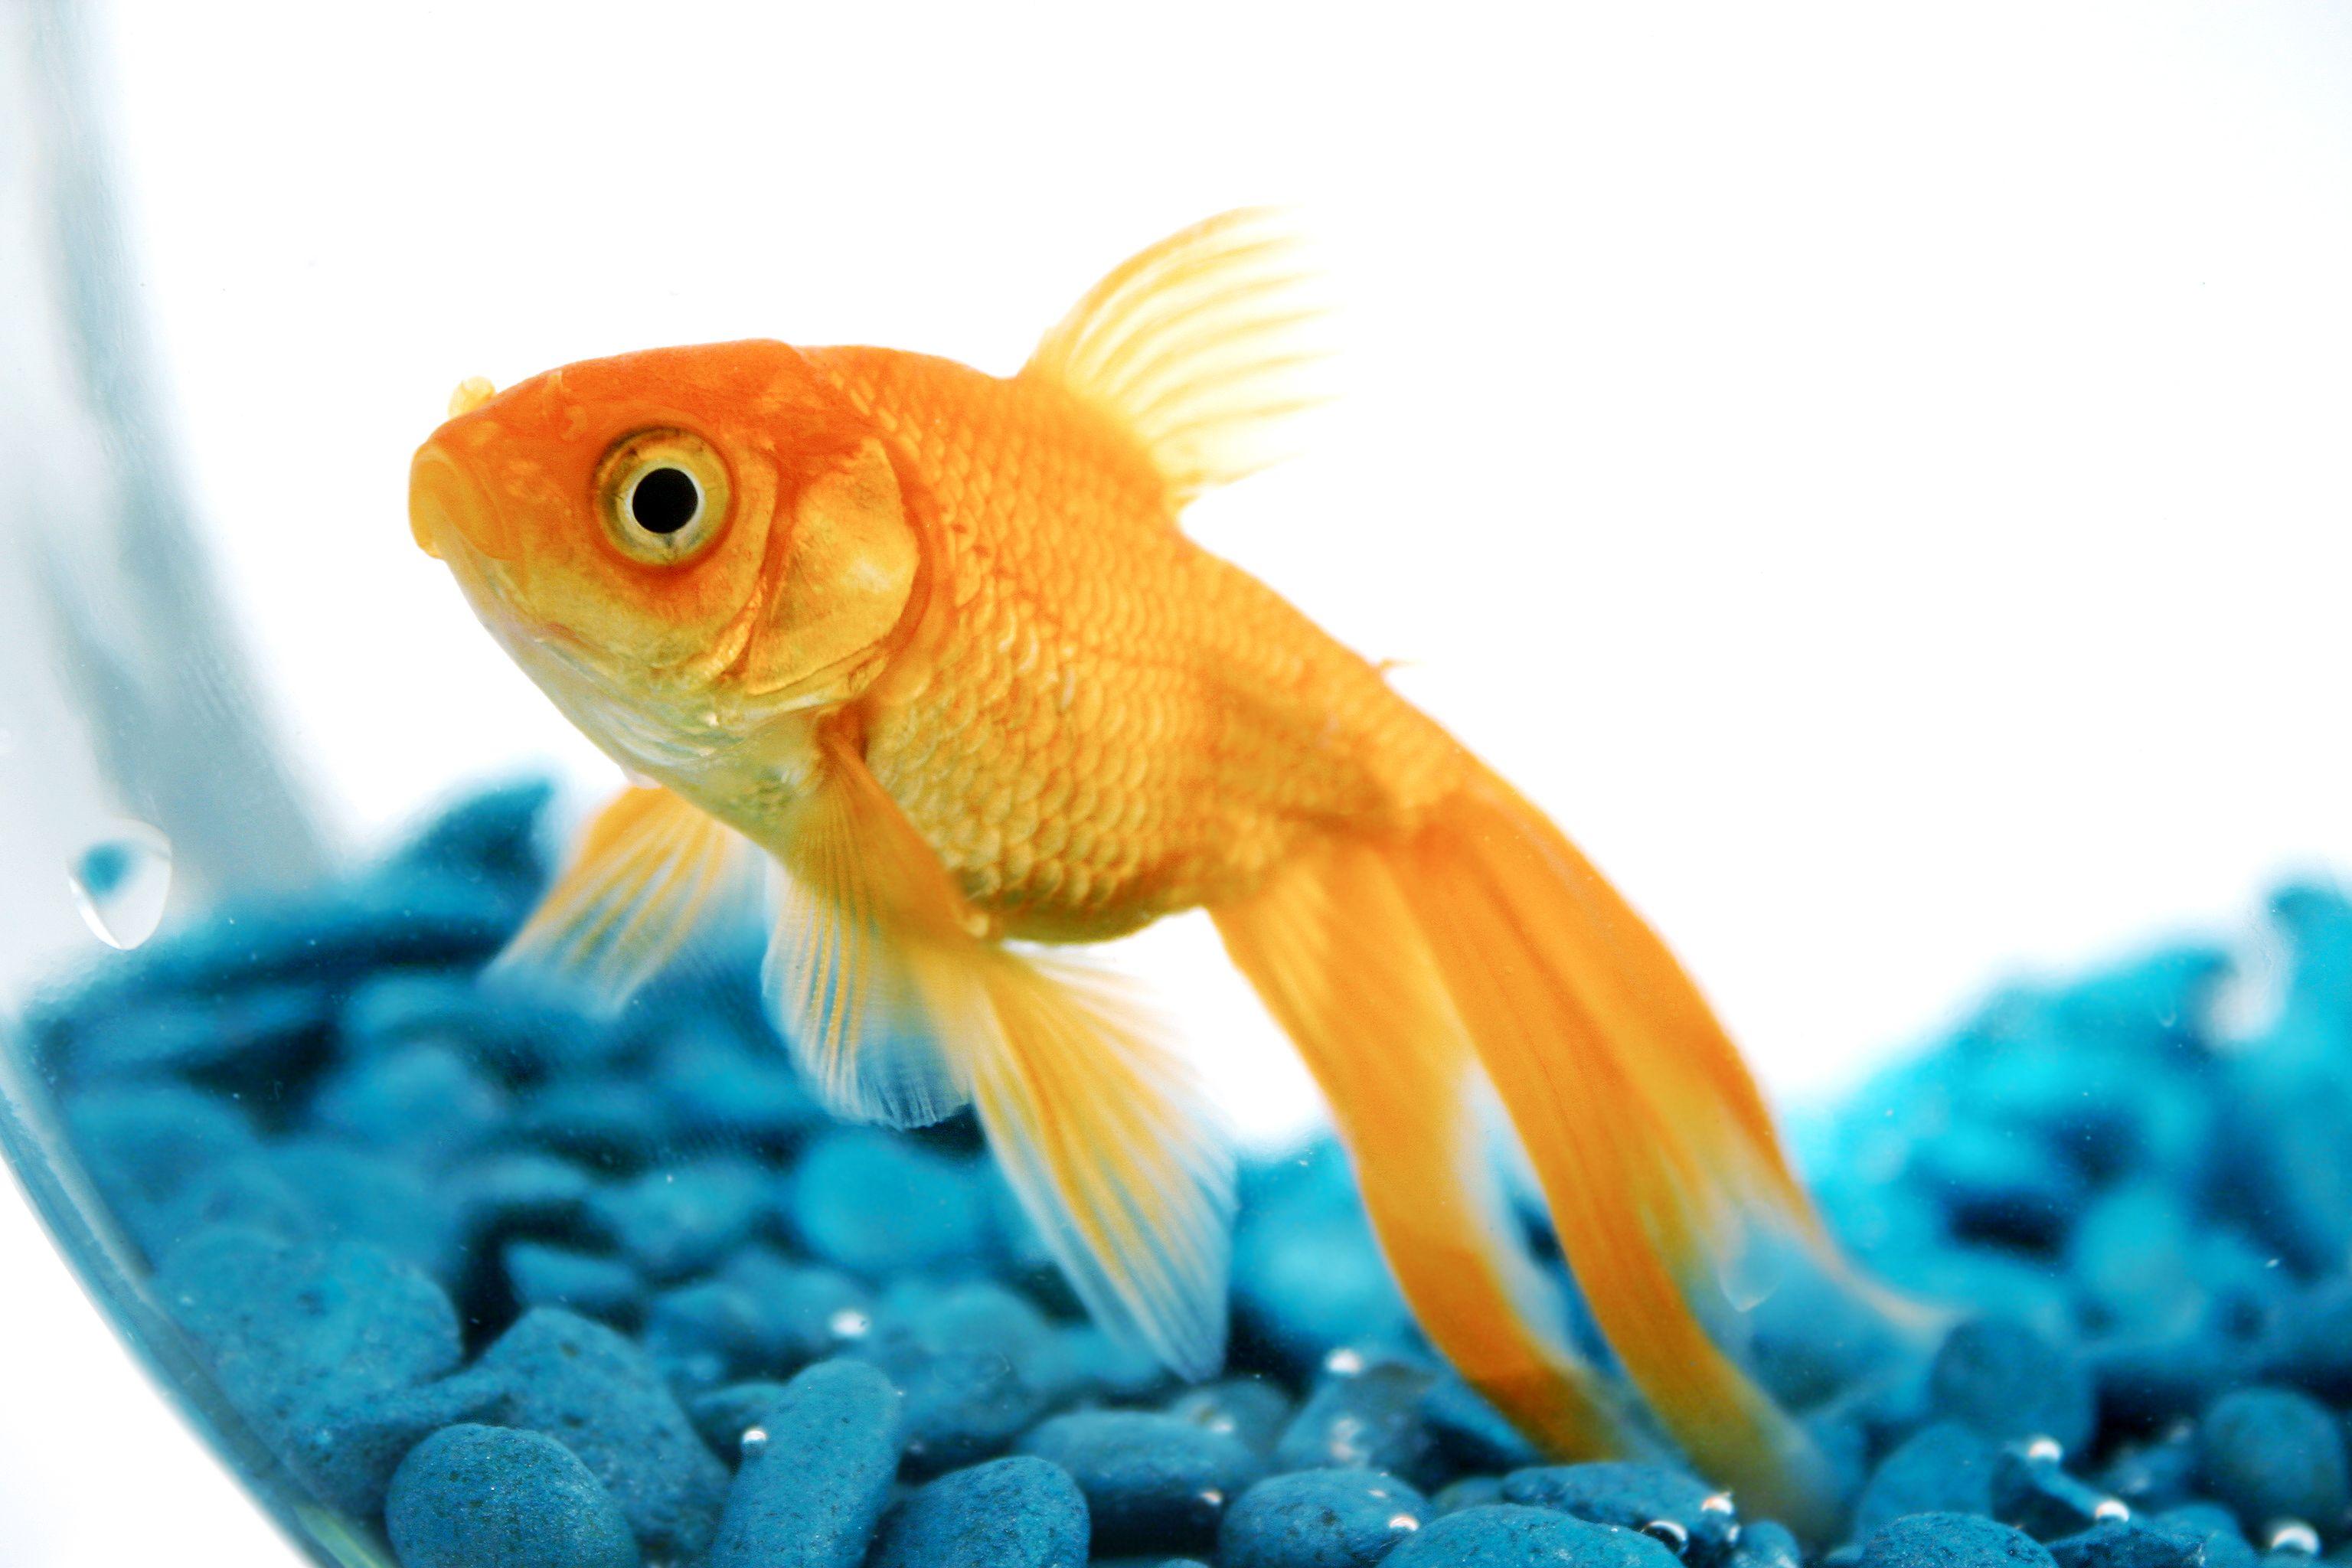 Pet goldfish may get banned in San Francisco Pet